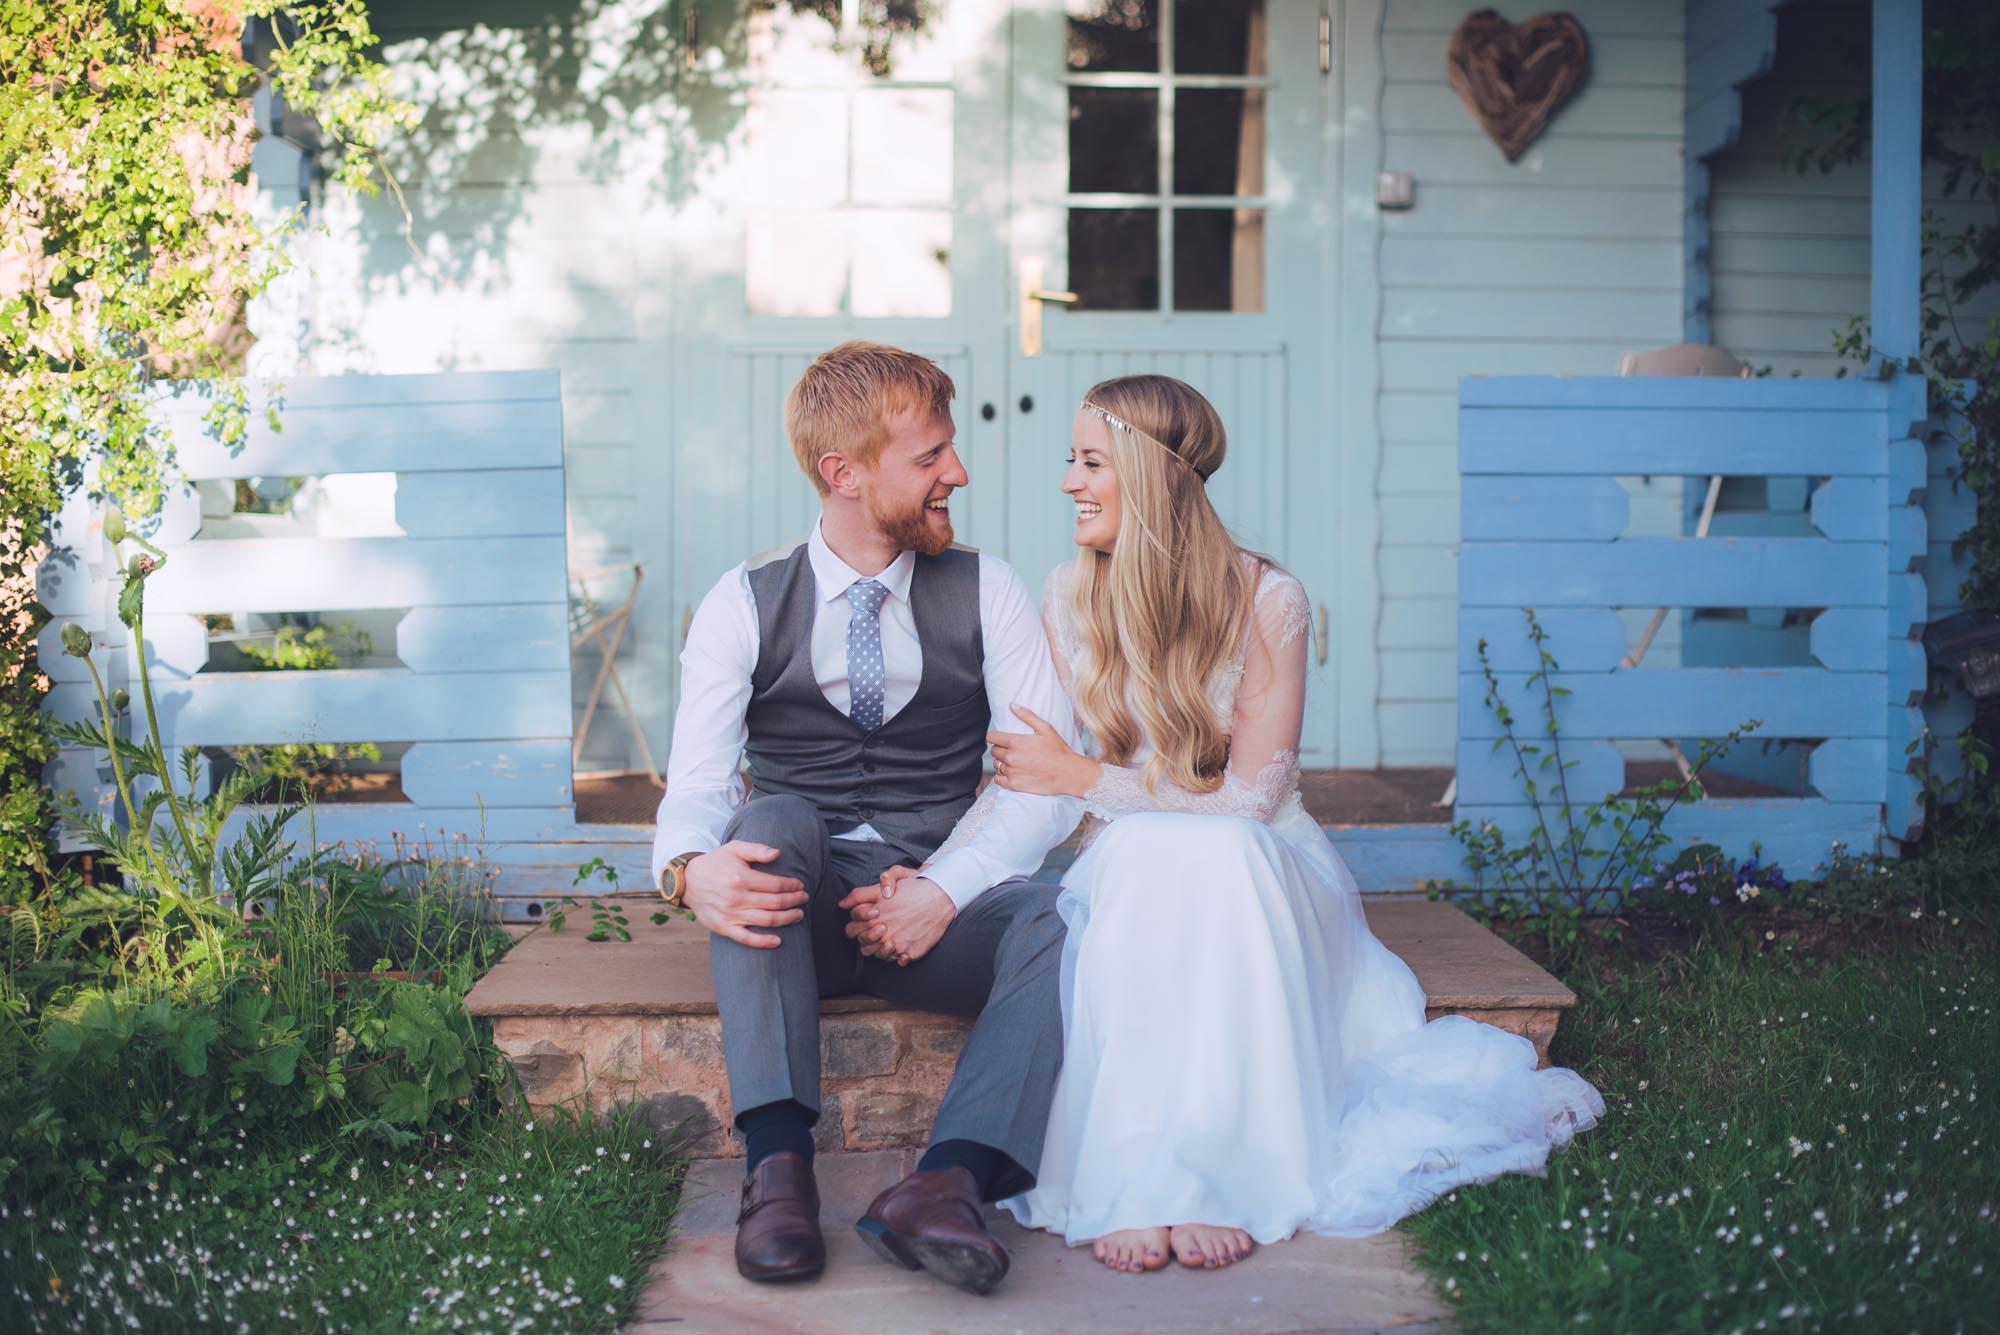 Nicola & Richard Wedding at Huntstile Farm